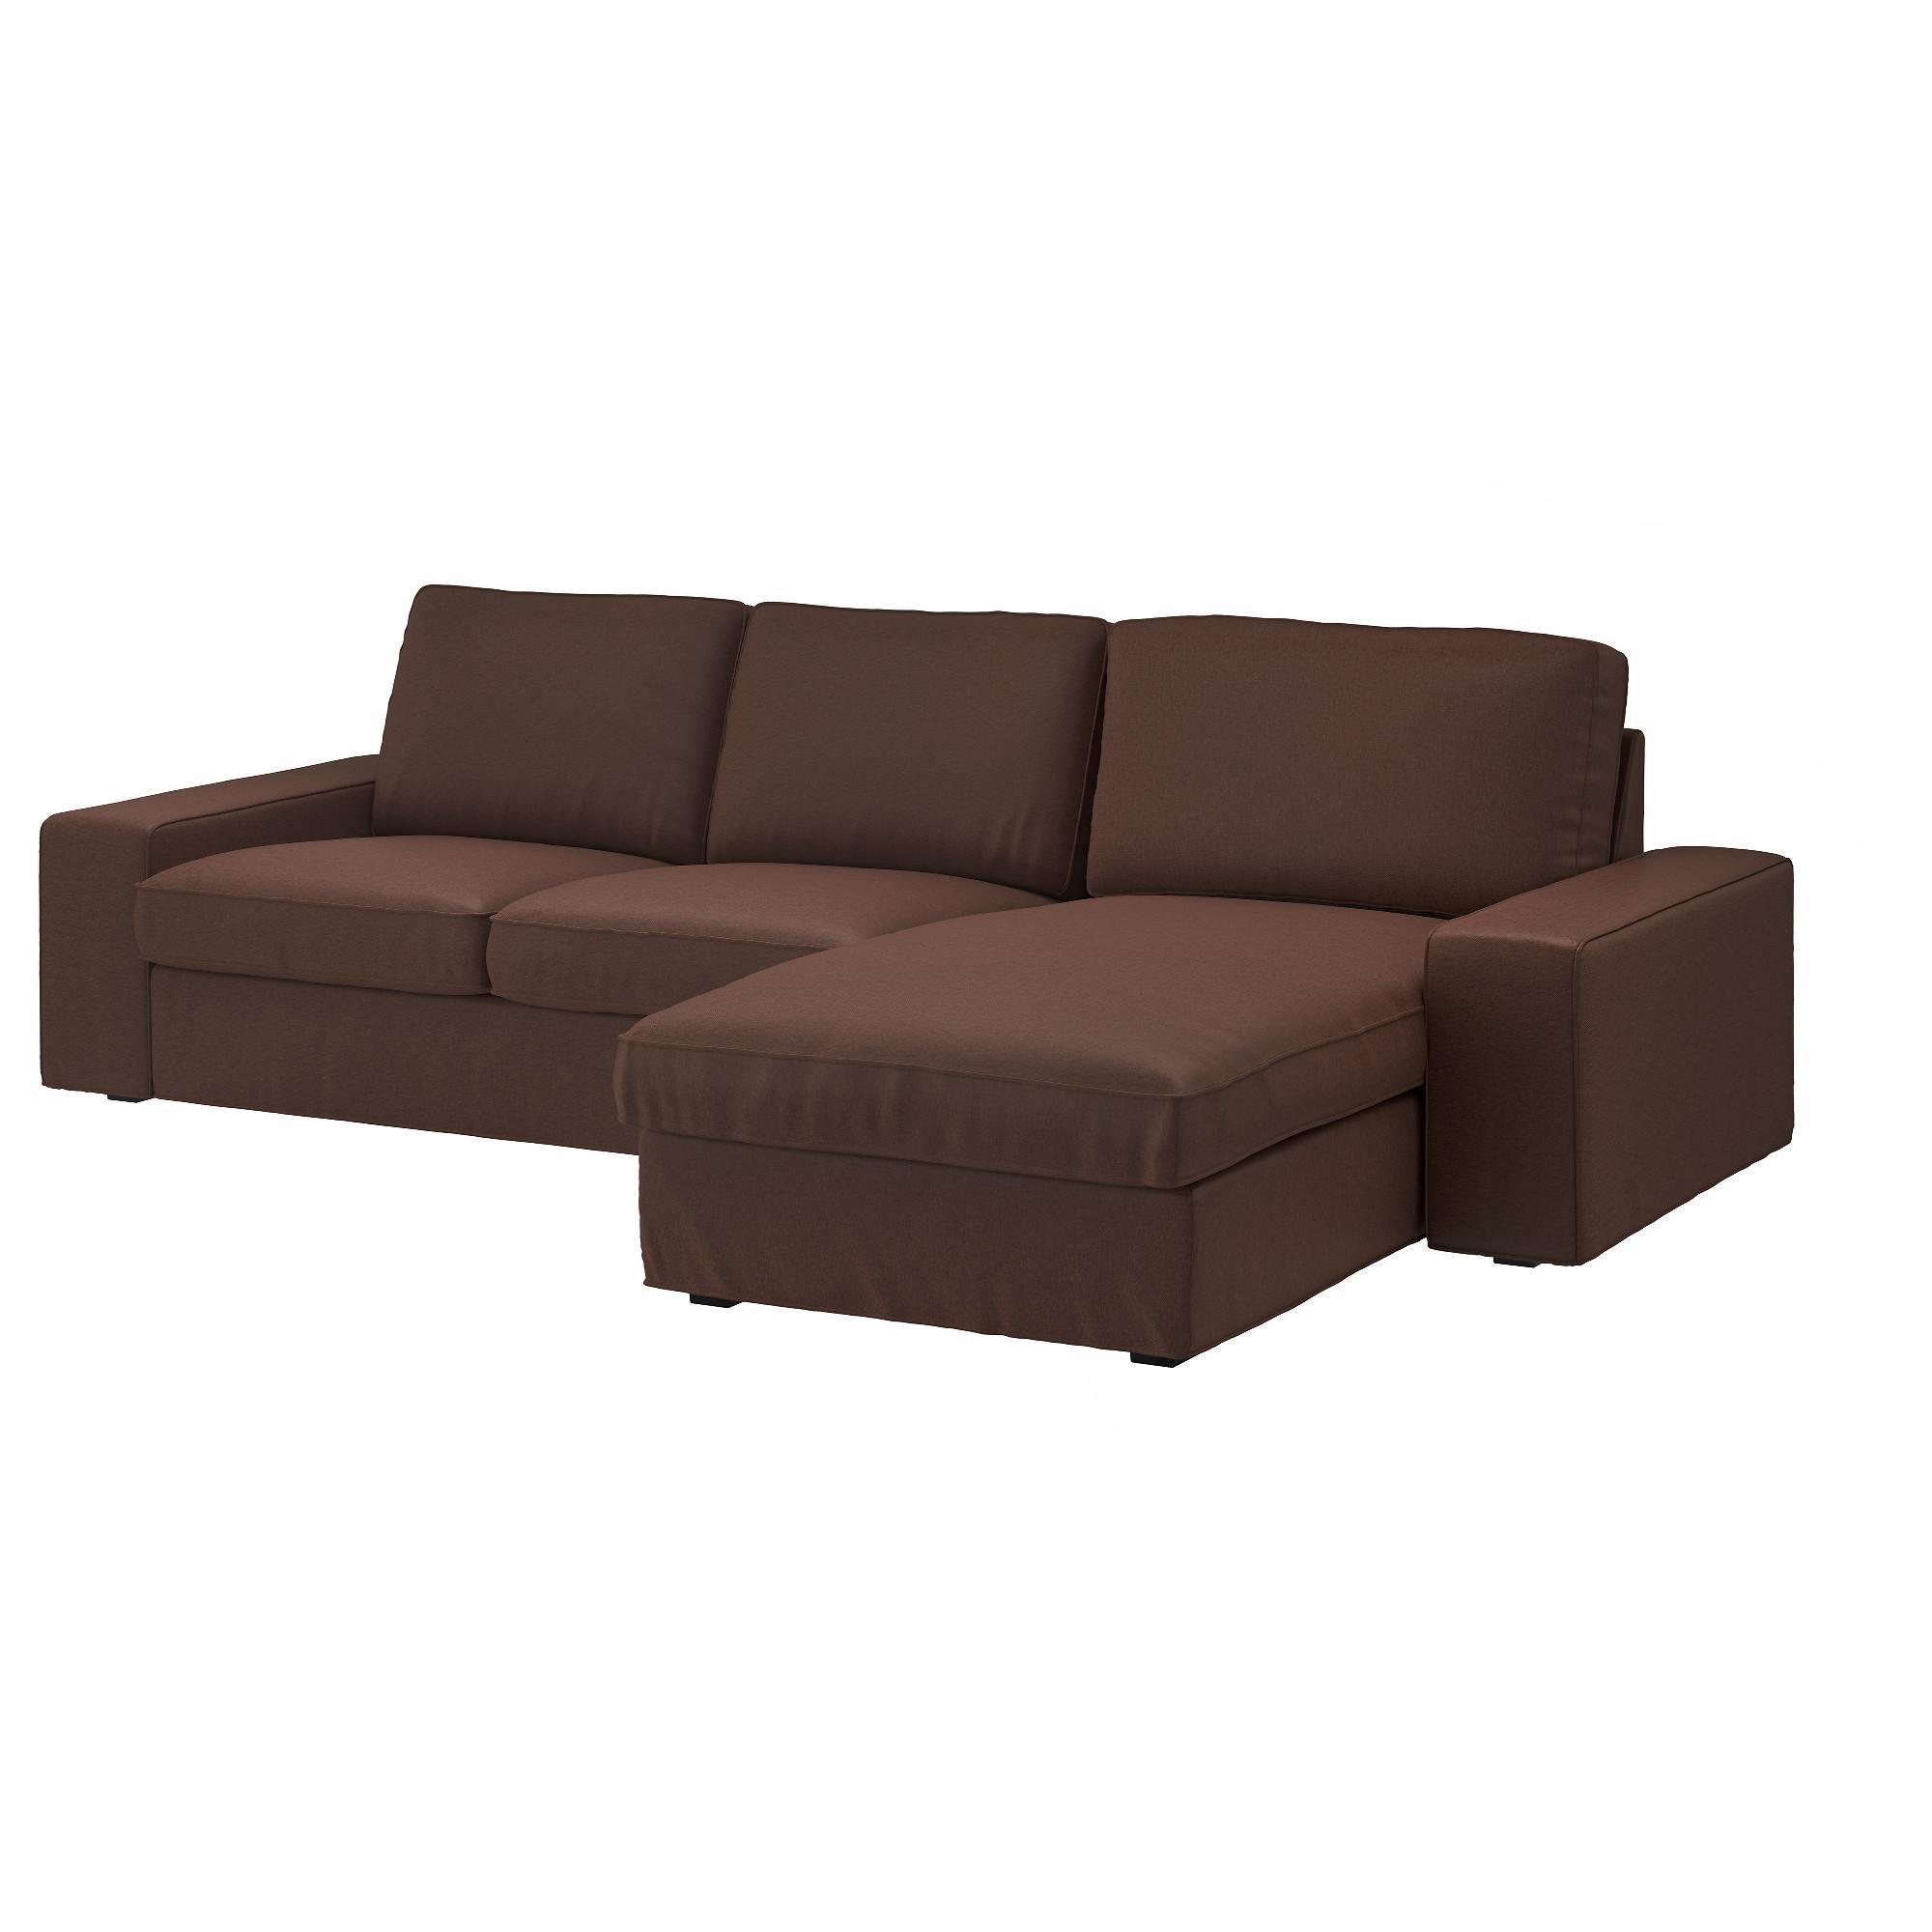 Kivik Sectional, 3-Seat - Borred Dark Brown - Ikea regarding Mini Sofa Sleepers